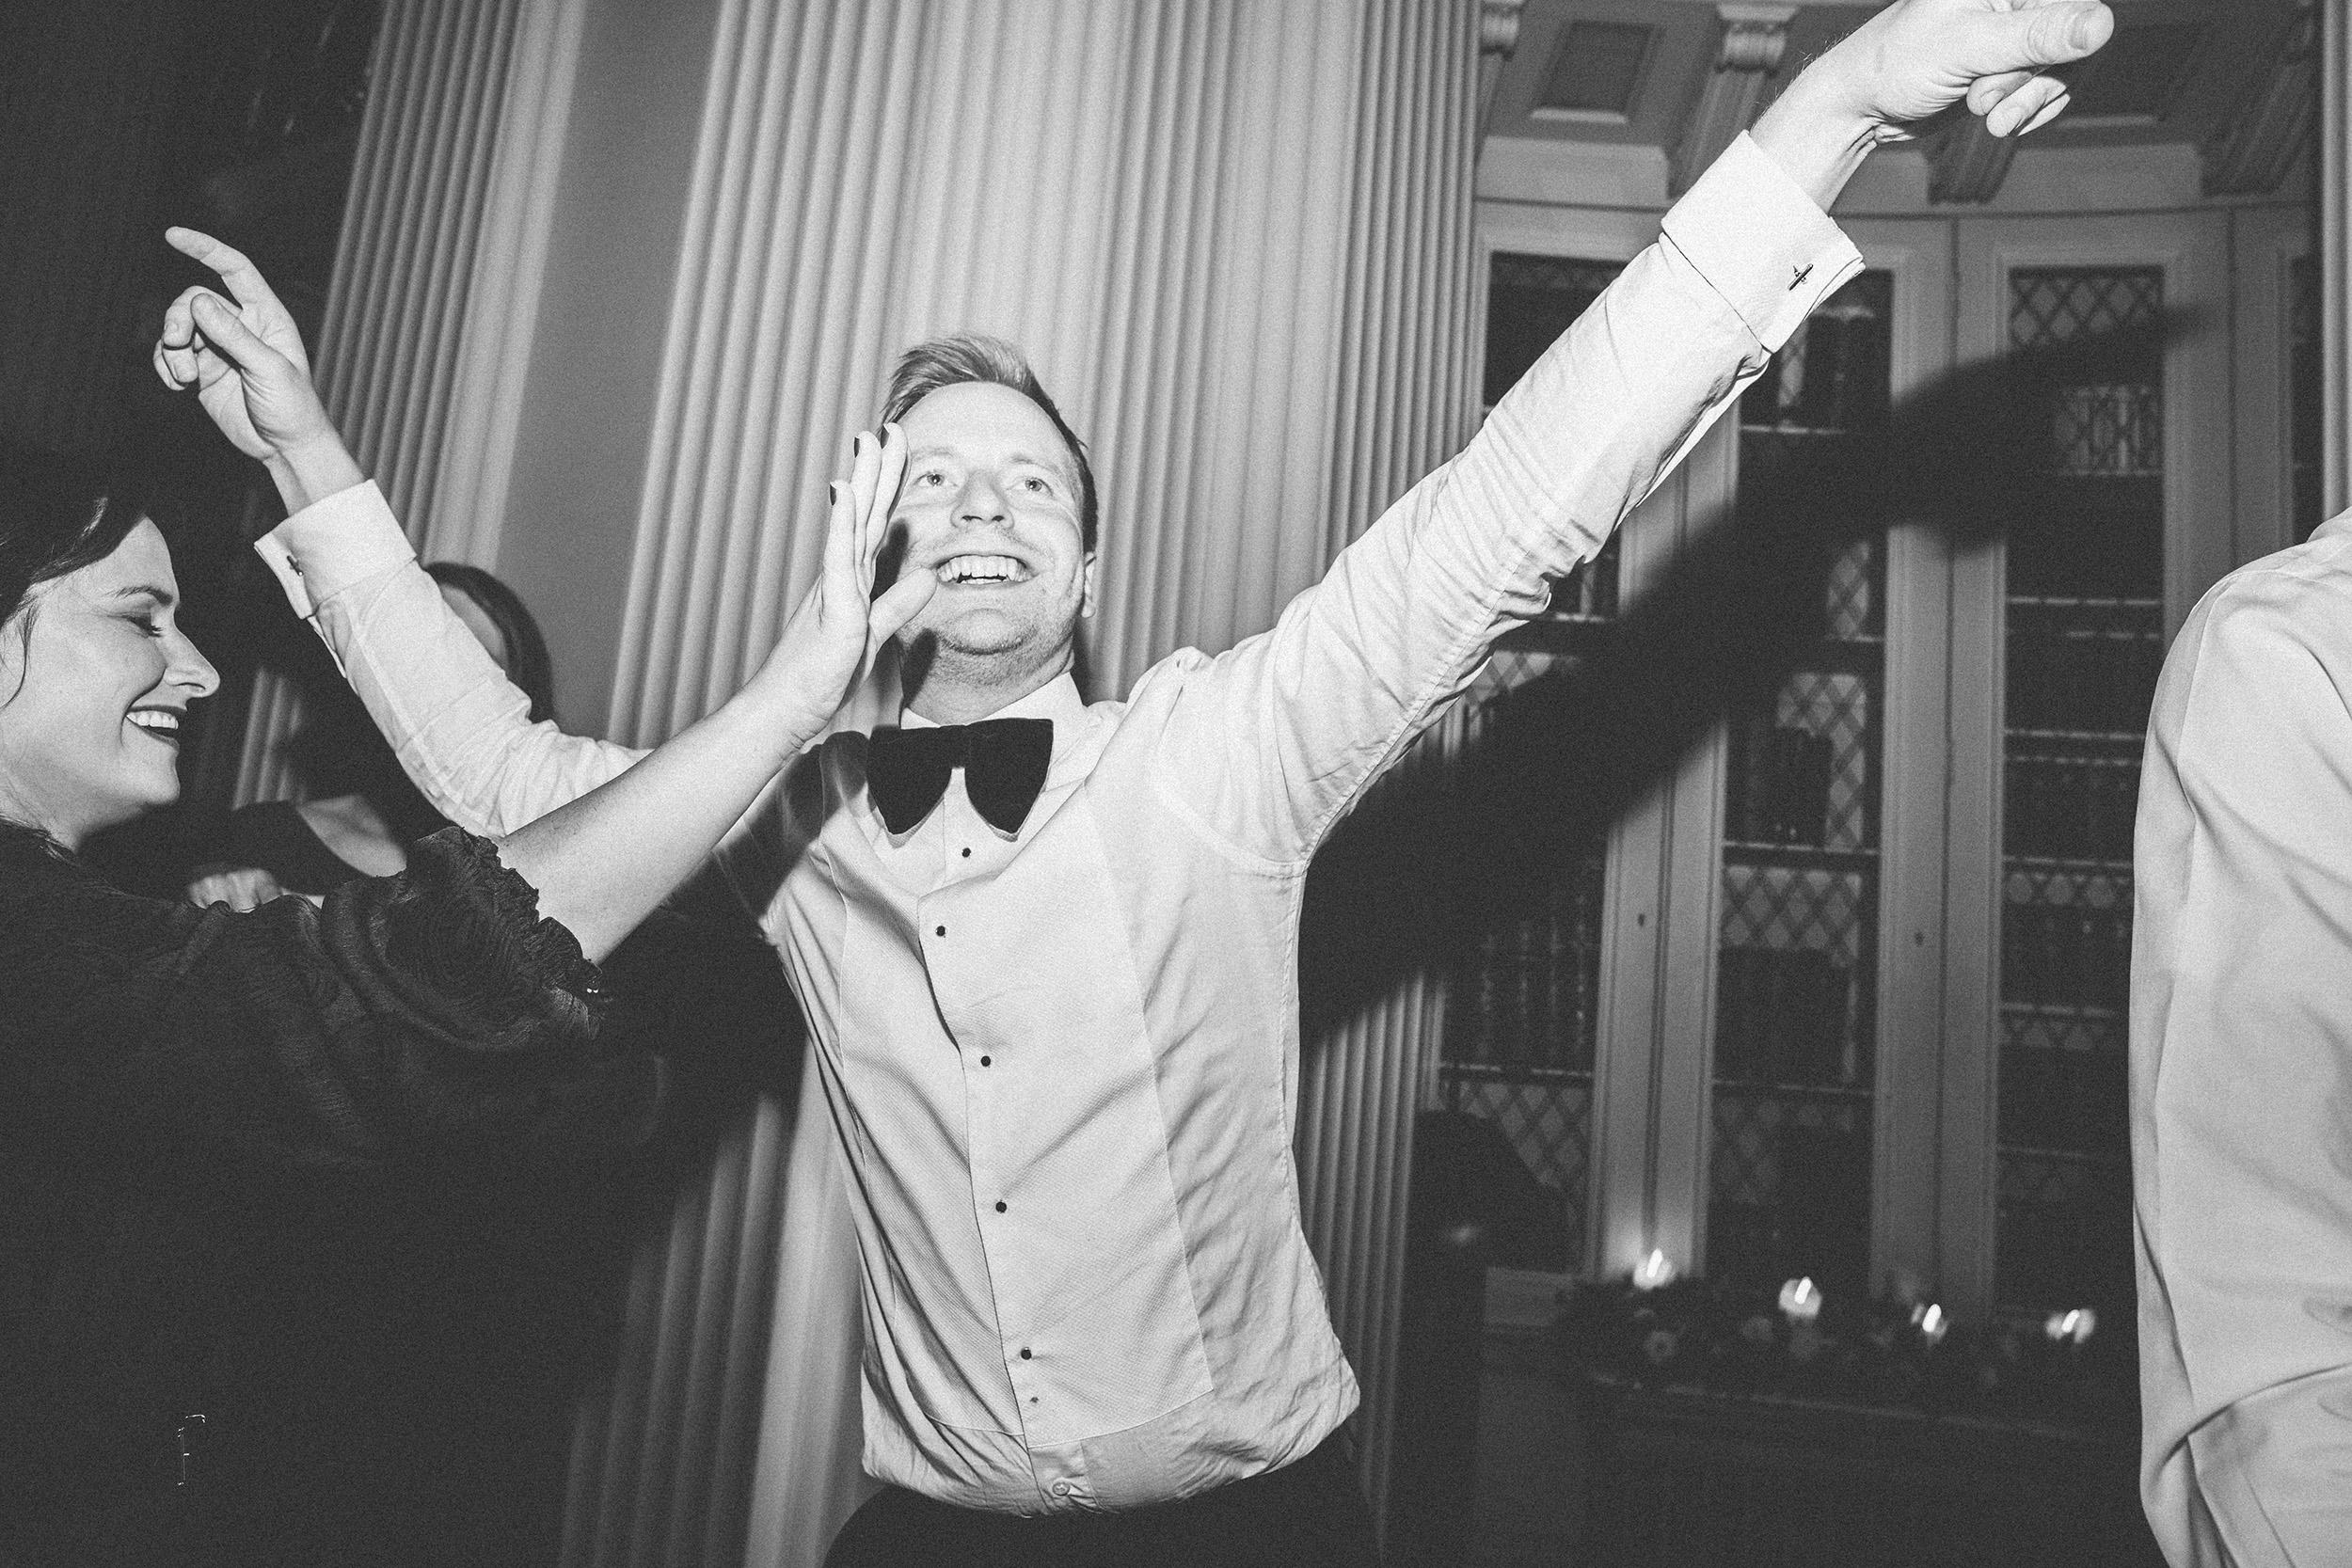 Quirky Wedding Photographer Scotland Glasgow Edinburgh Mirrorbox 243.jpg